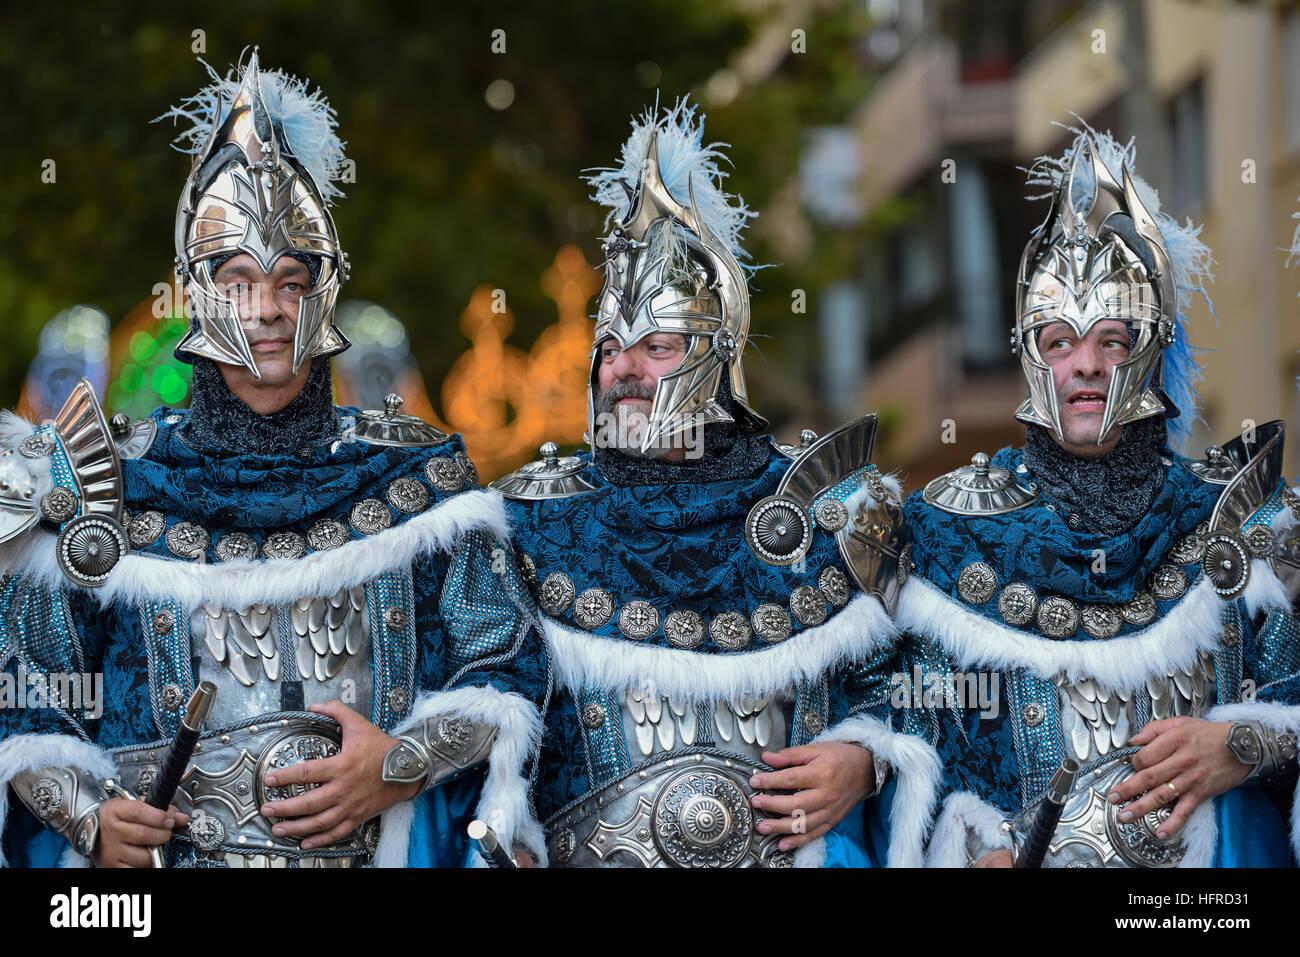 Parade, Moros y Cristianos, Moors and Christians, Dénia, Province of Valencia, Costa Blanca, Spain - Stock Image